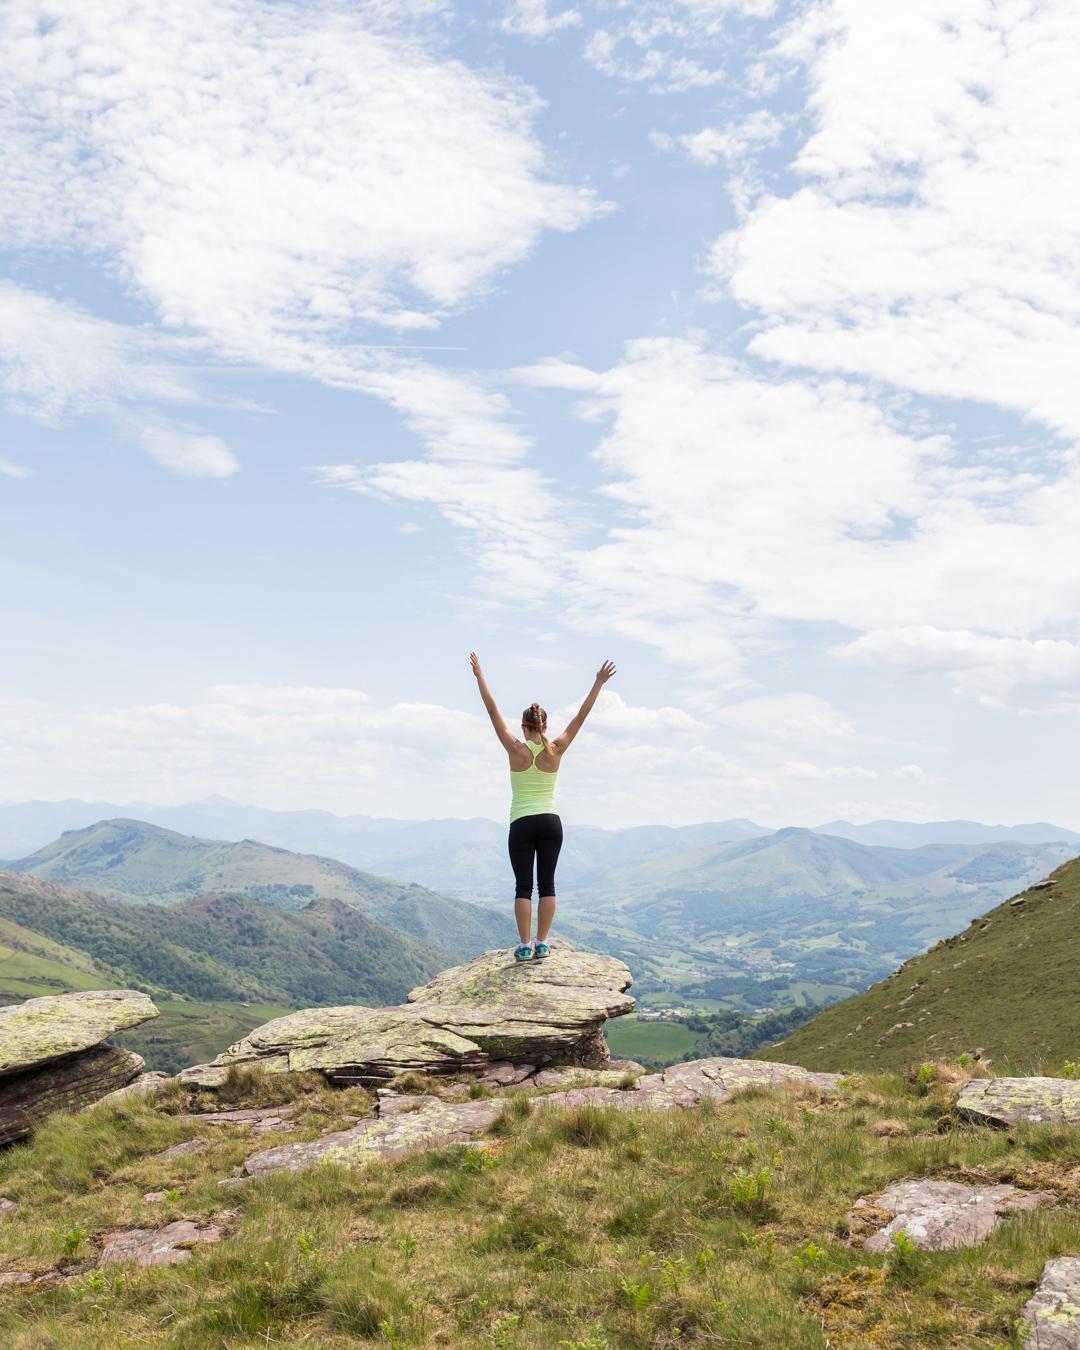 blog sport montagne randonnée trail running